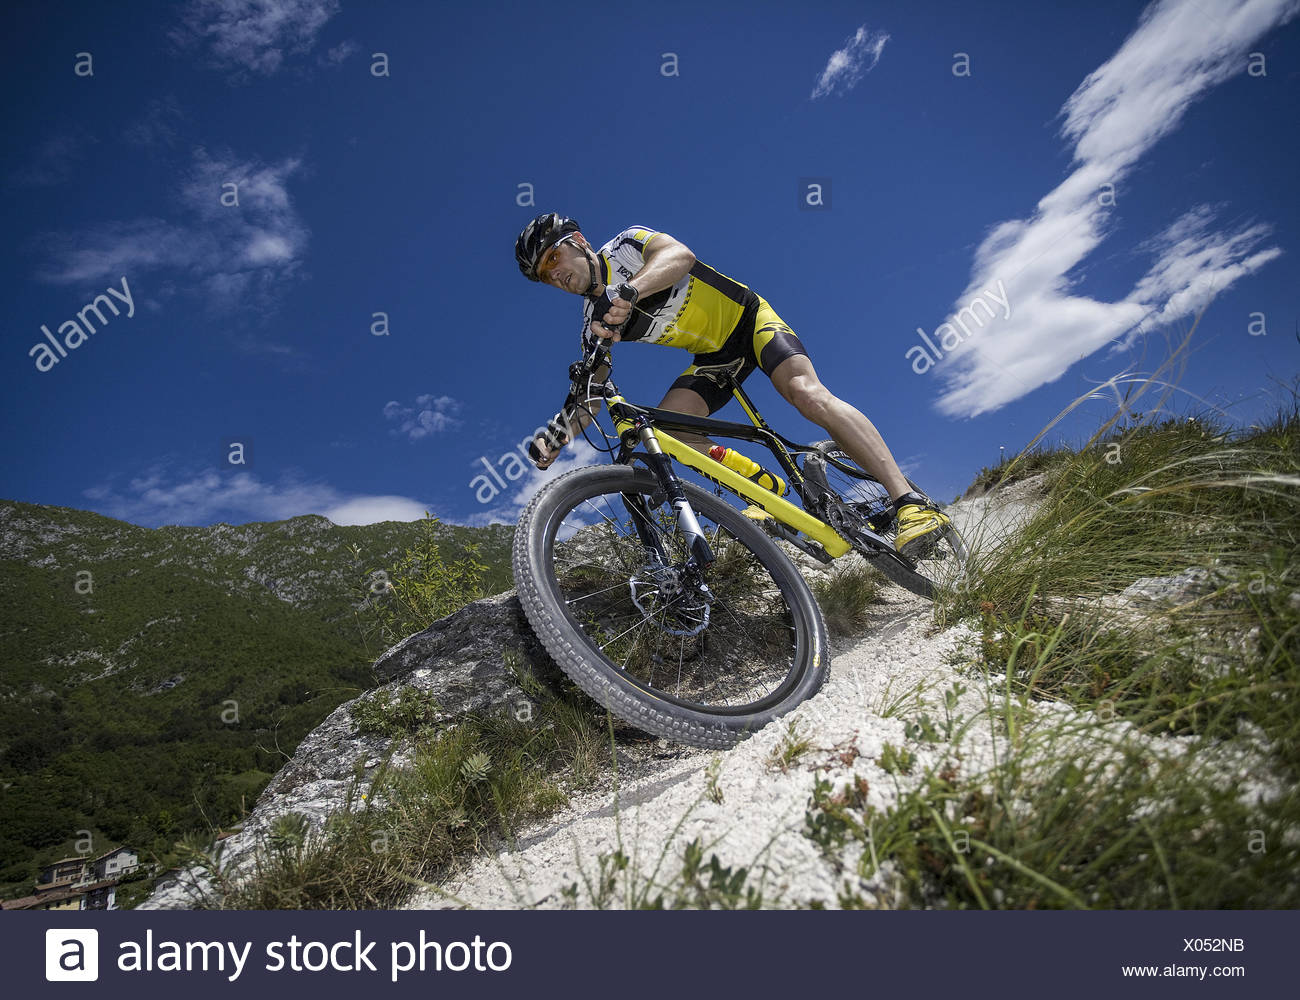 Mann mit Mountainbike im Gebirge (modèle récent) Photo Stock